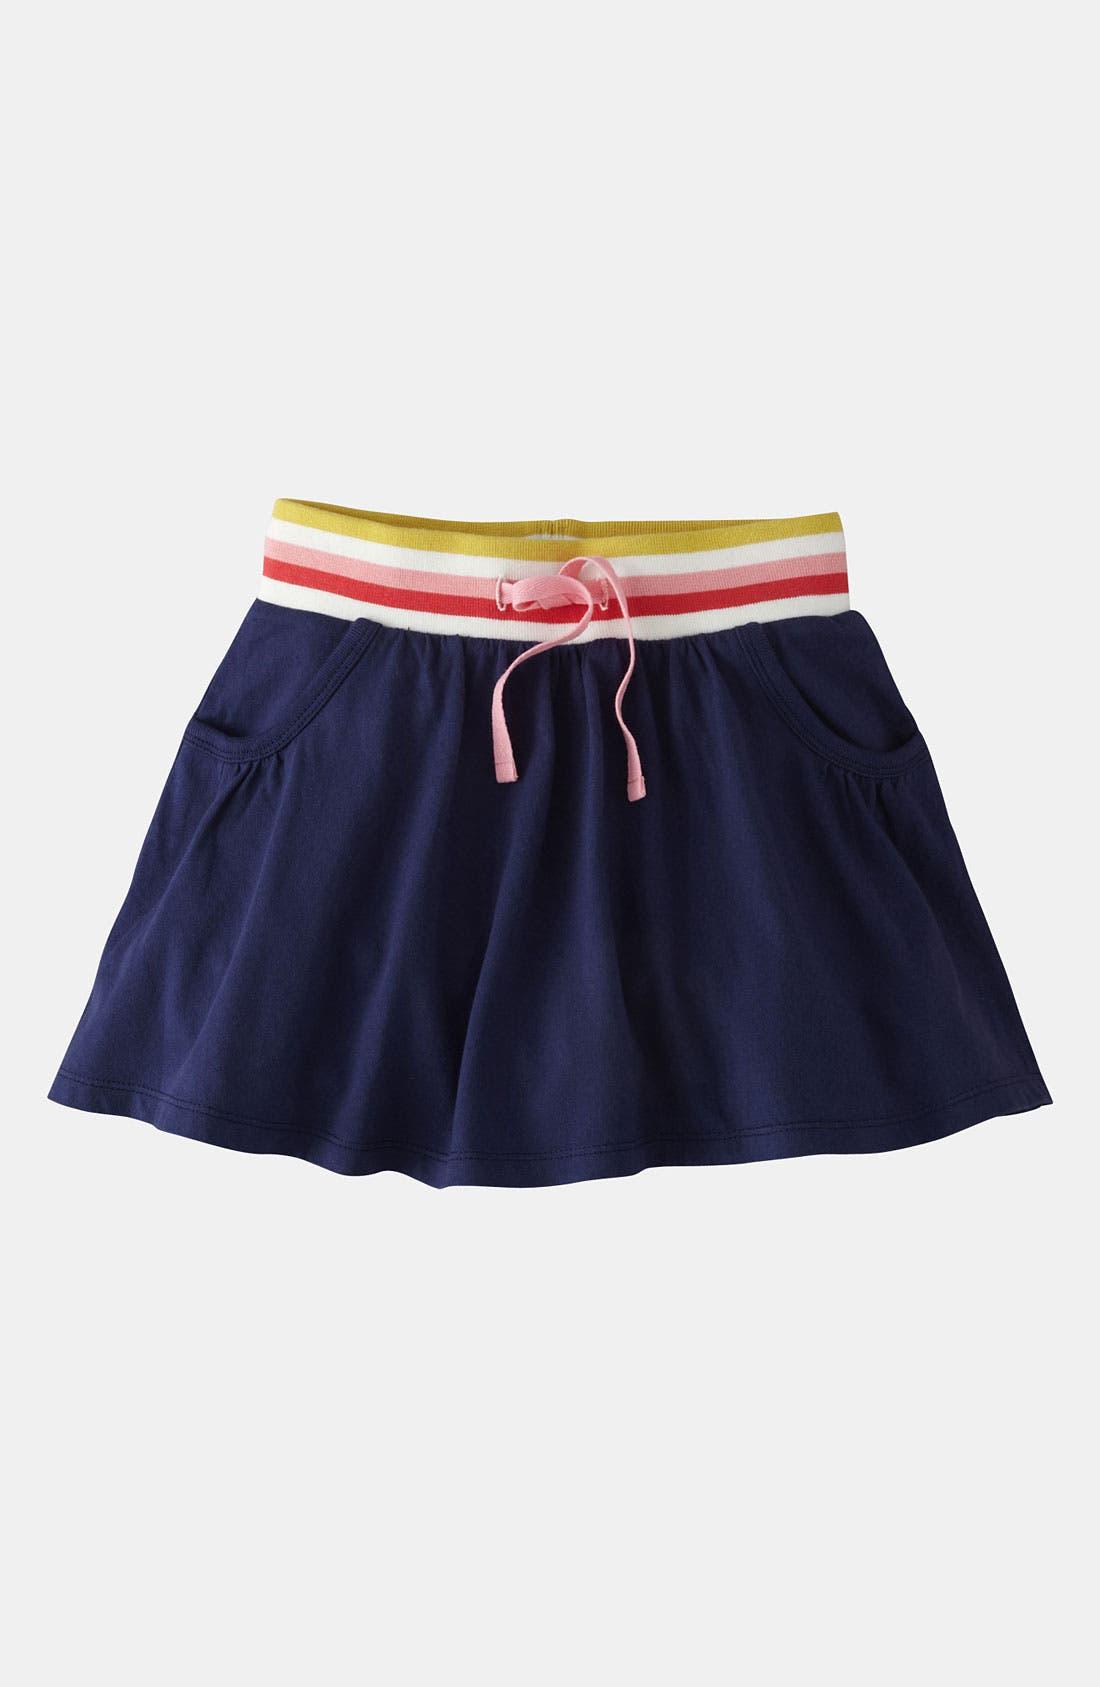 Alternate Image 1 Selected - Mini Boden Jersey Scooter Skirt (Little Girls & Big Girls)